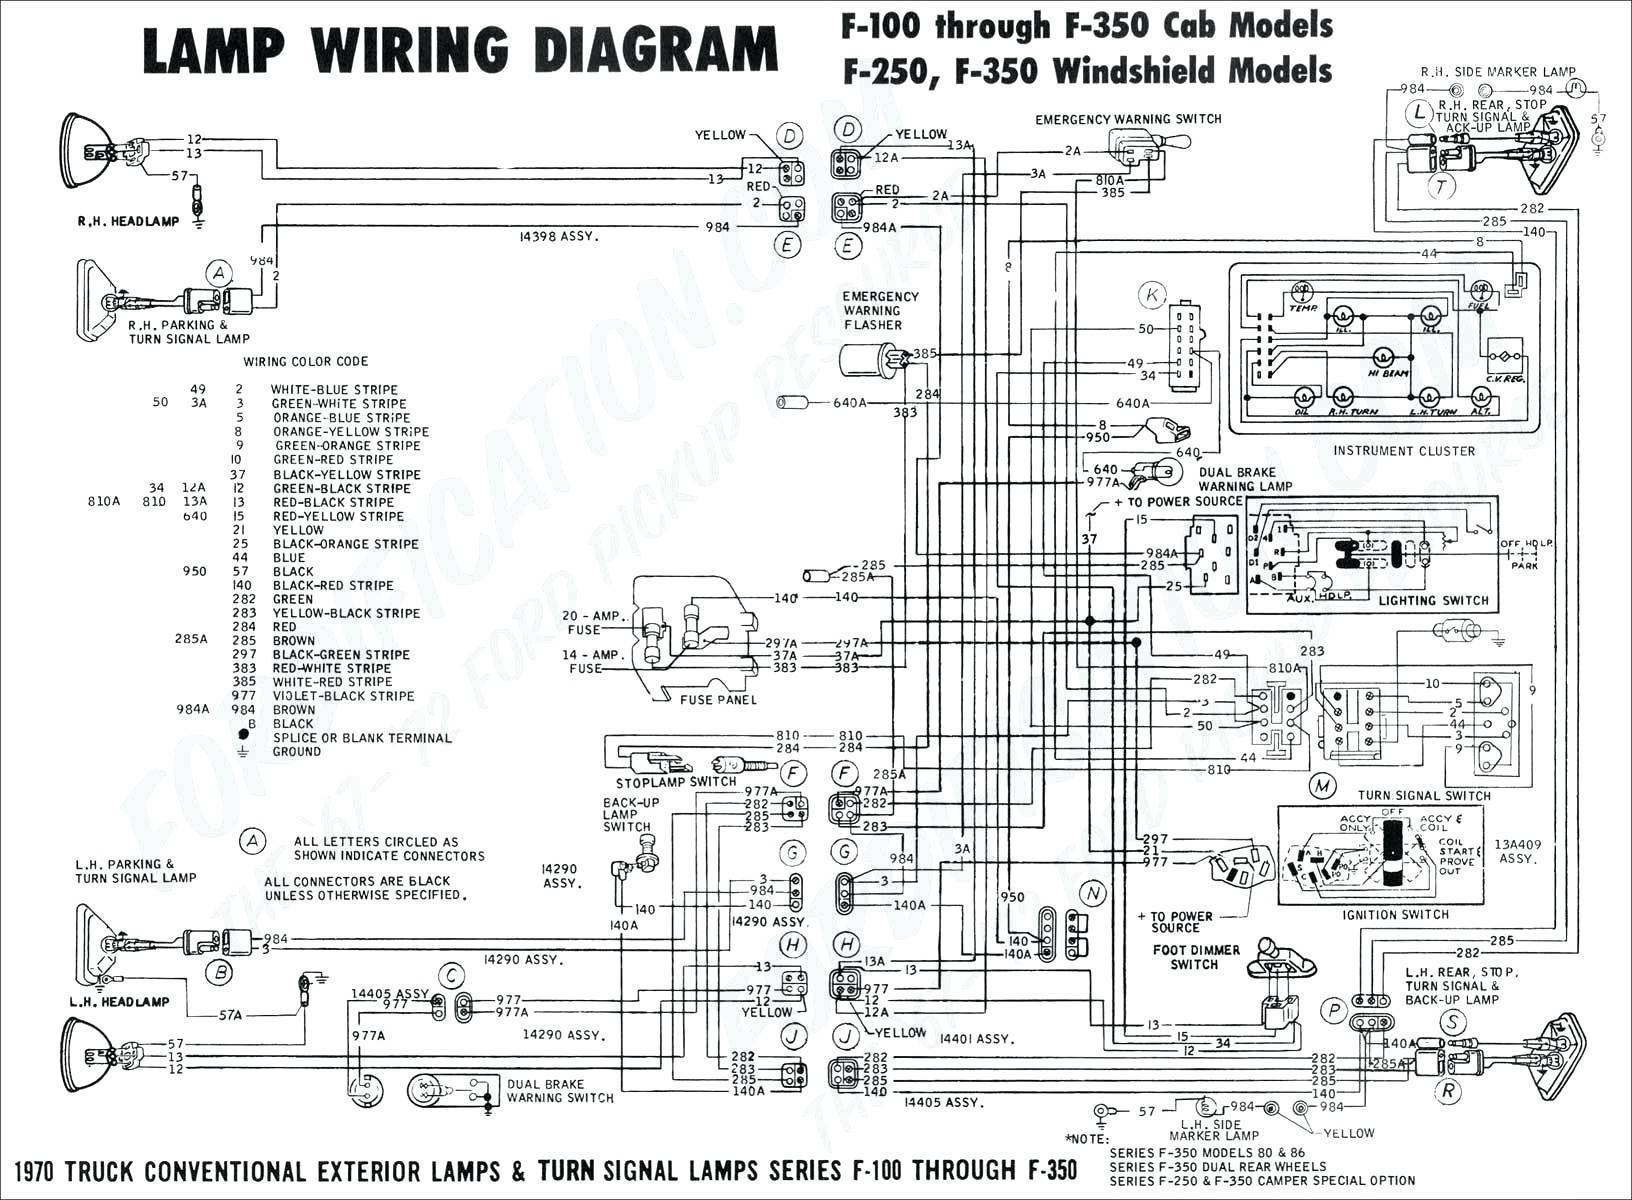 Honda Accord Radio Wiring Diagram mikulskilawoffices